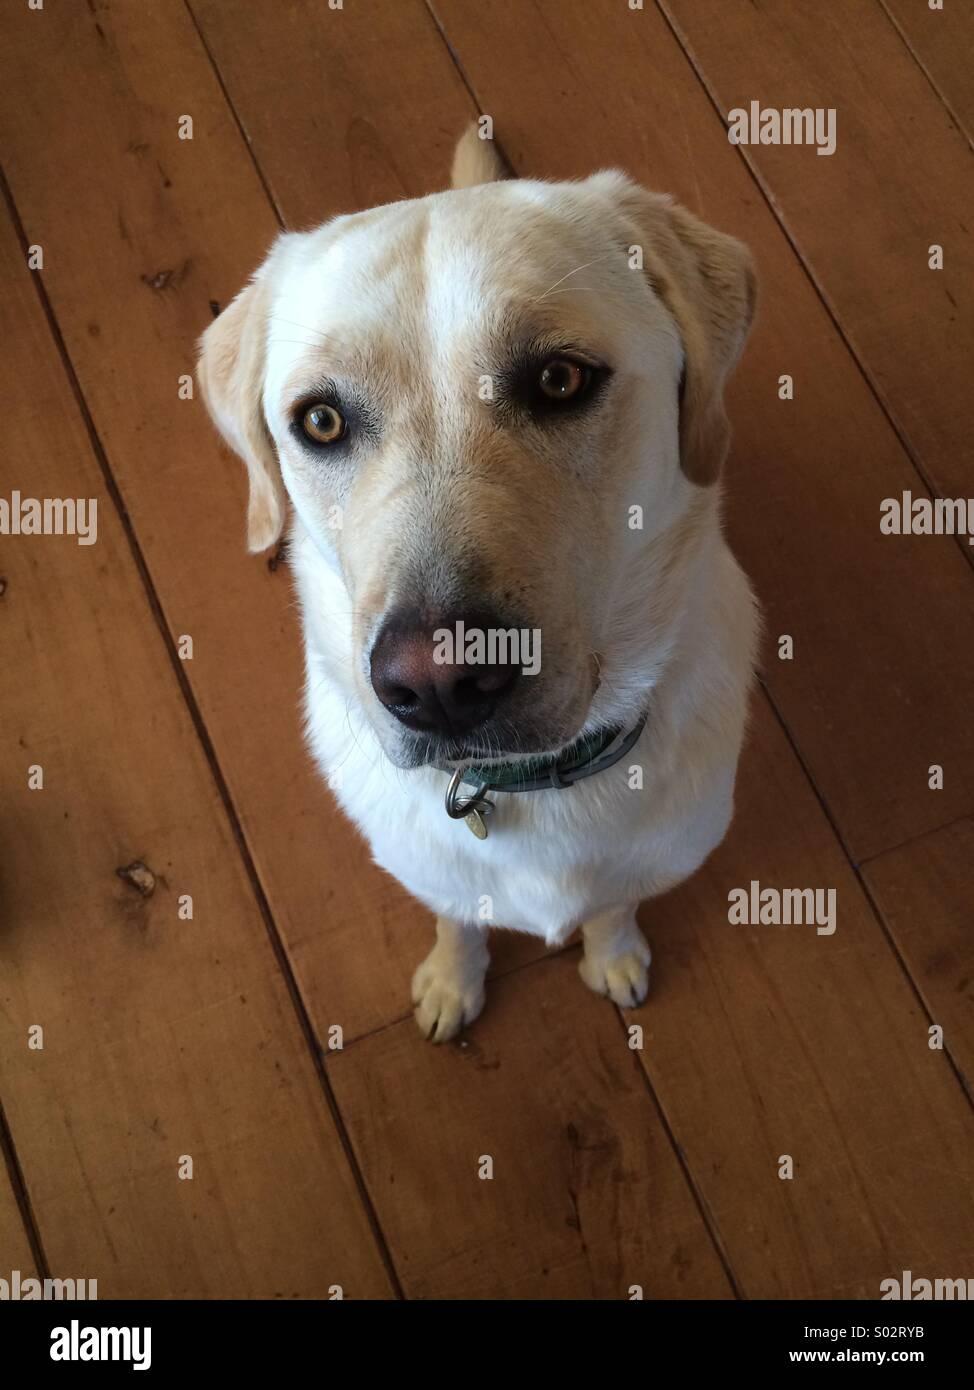 Obedient Labrador - Stock Image